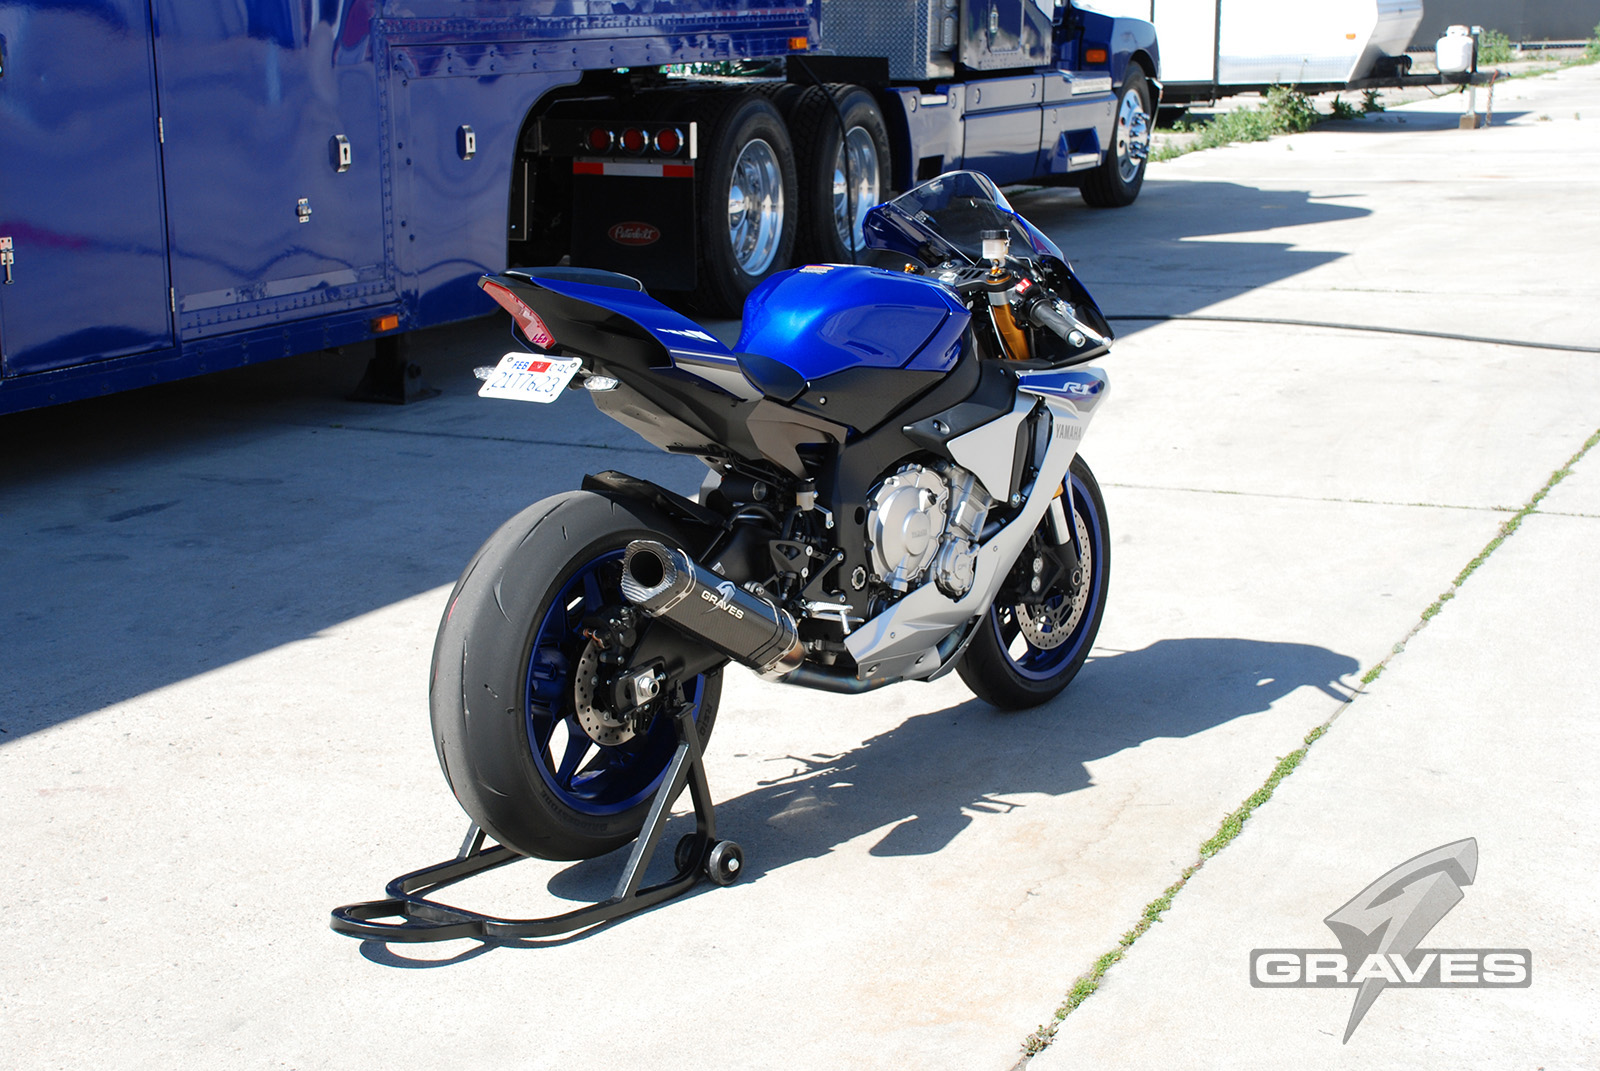 Graves Motorsports Yamaha R1 2015+ Fender Eliminator Tail TIdy